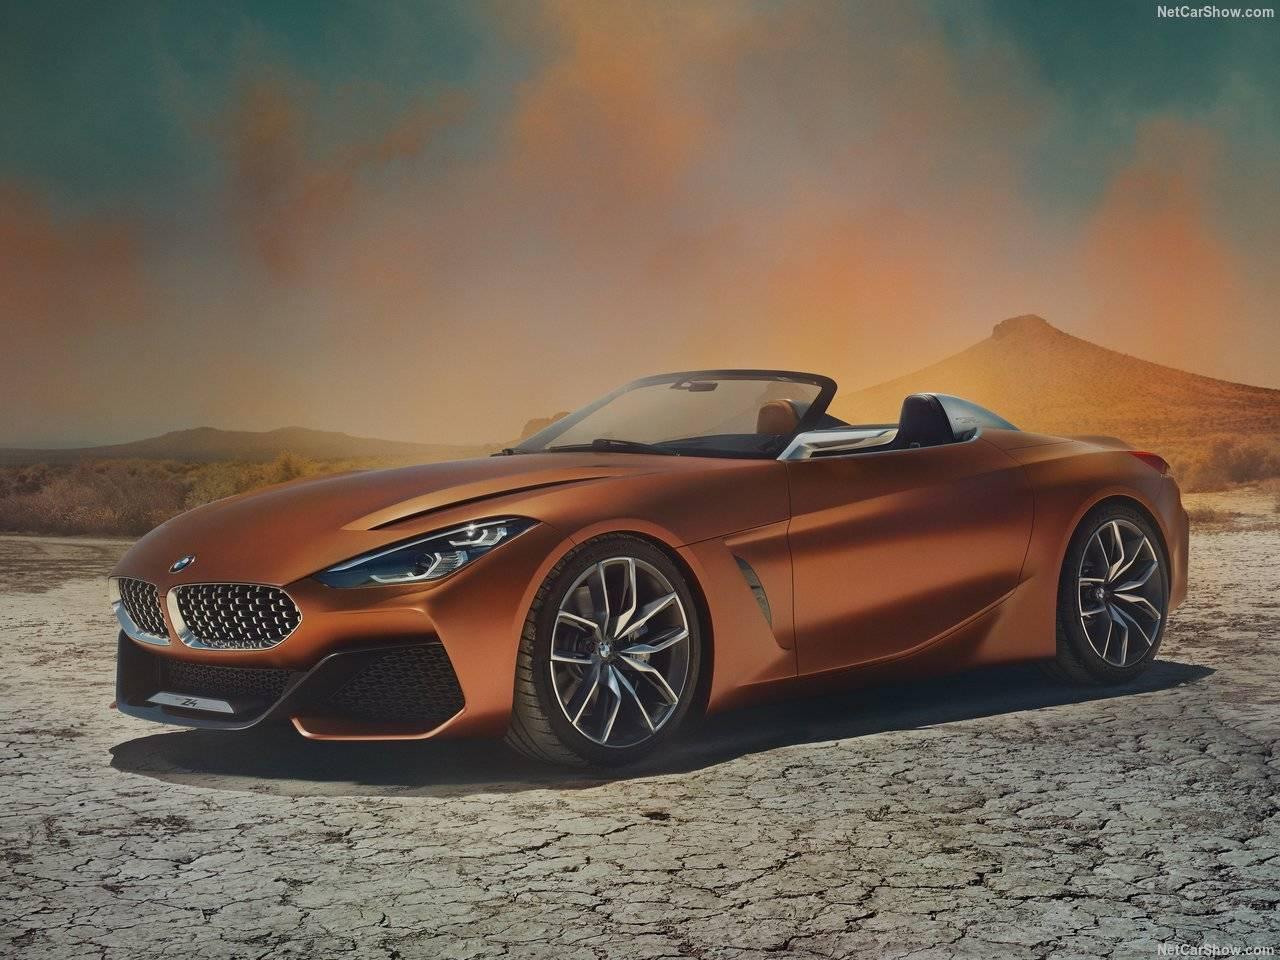 2018 BMW 次期新型Z4が見えた!Concept Z4発表!次期トヨタスープラとプラットフォームを共有!